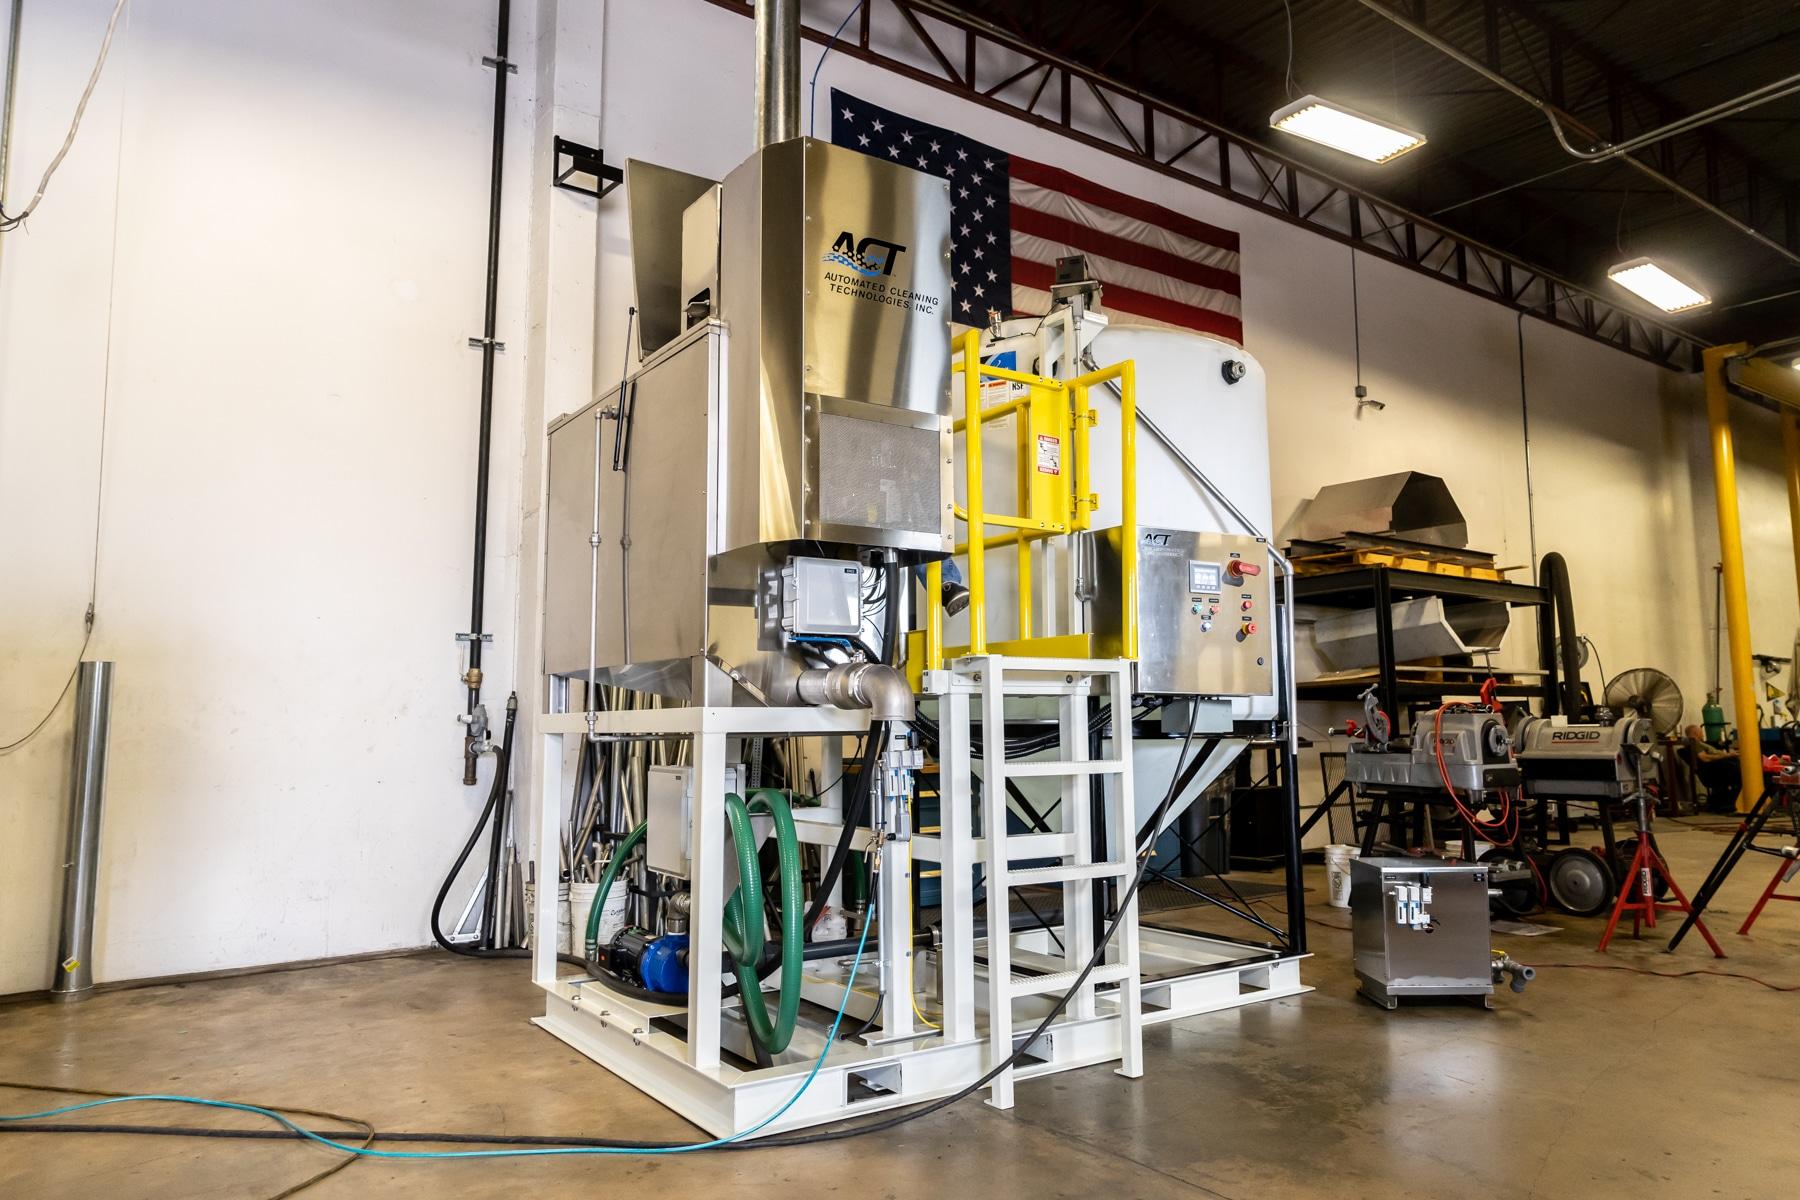 ACT-1800S-Industrial-Evaporators-Hi-Res-3